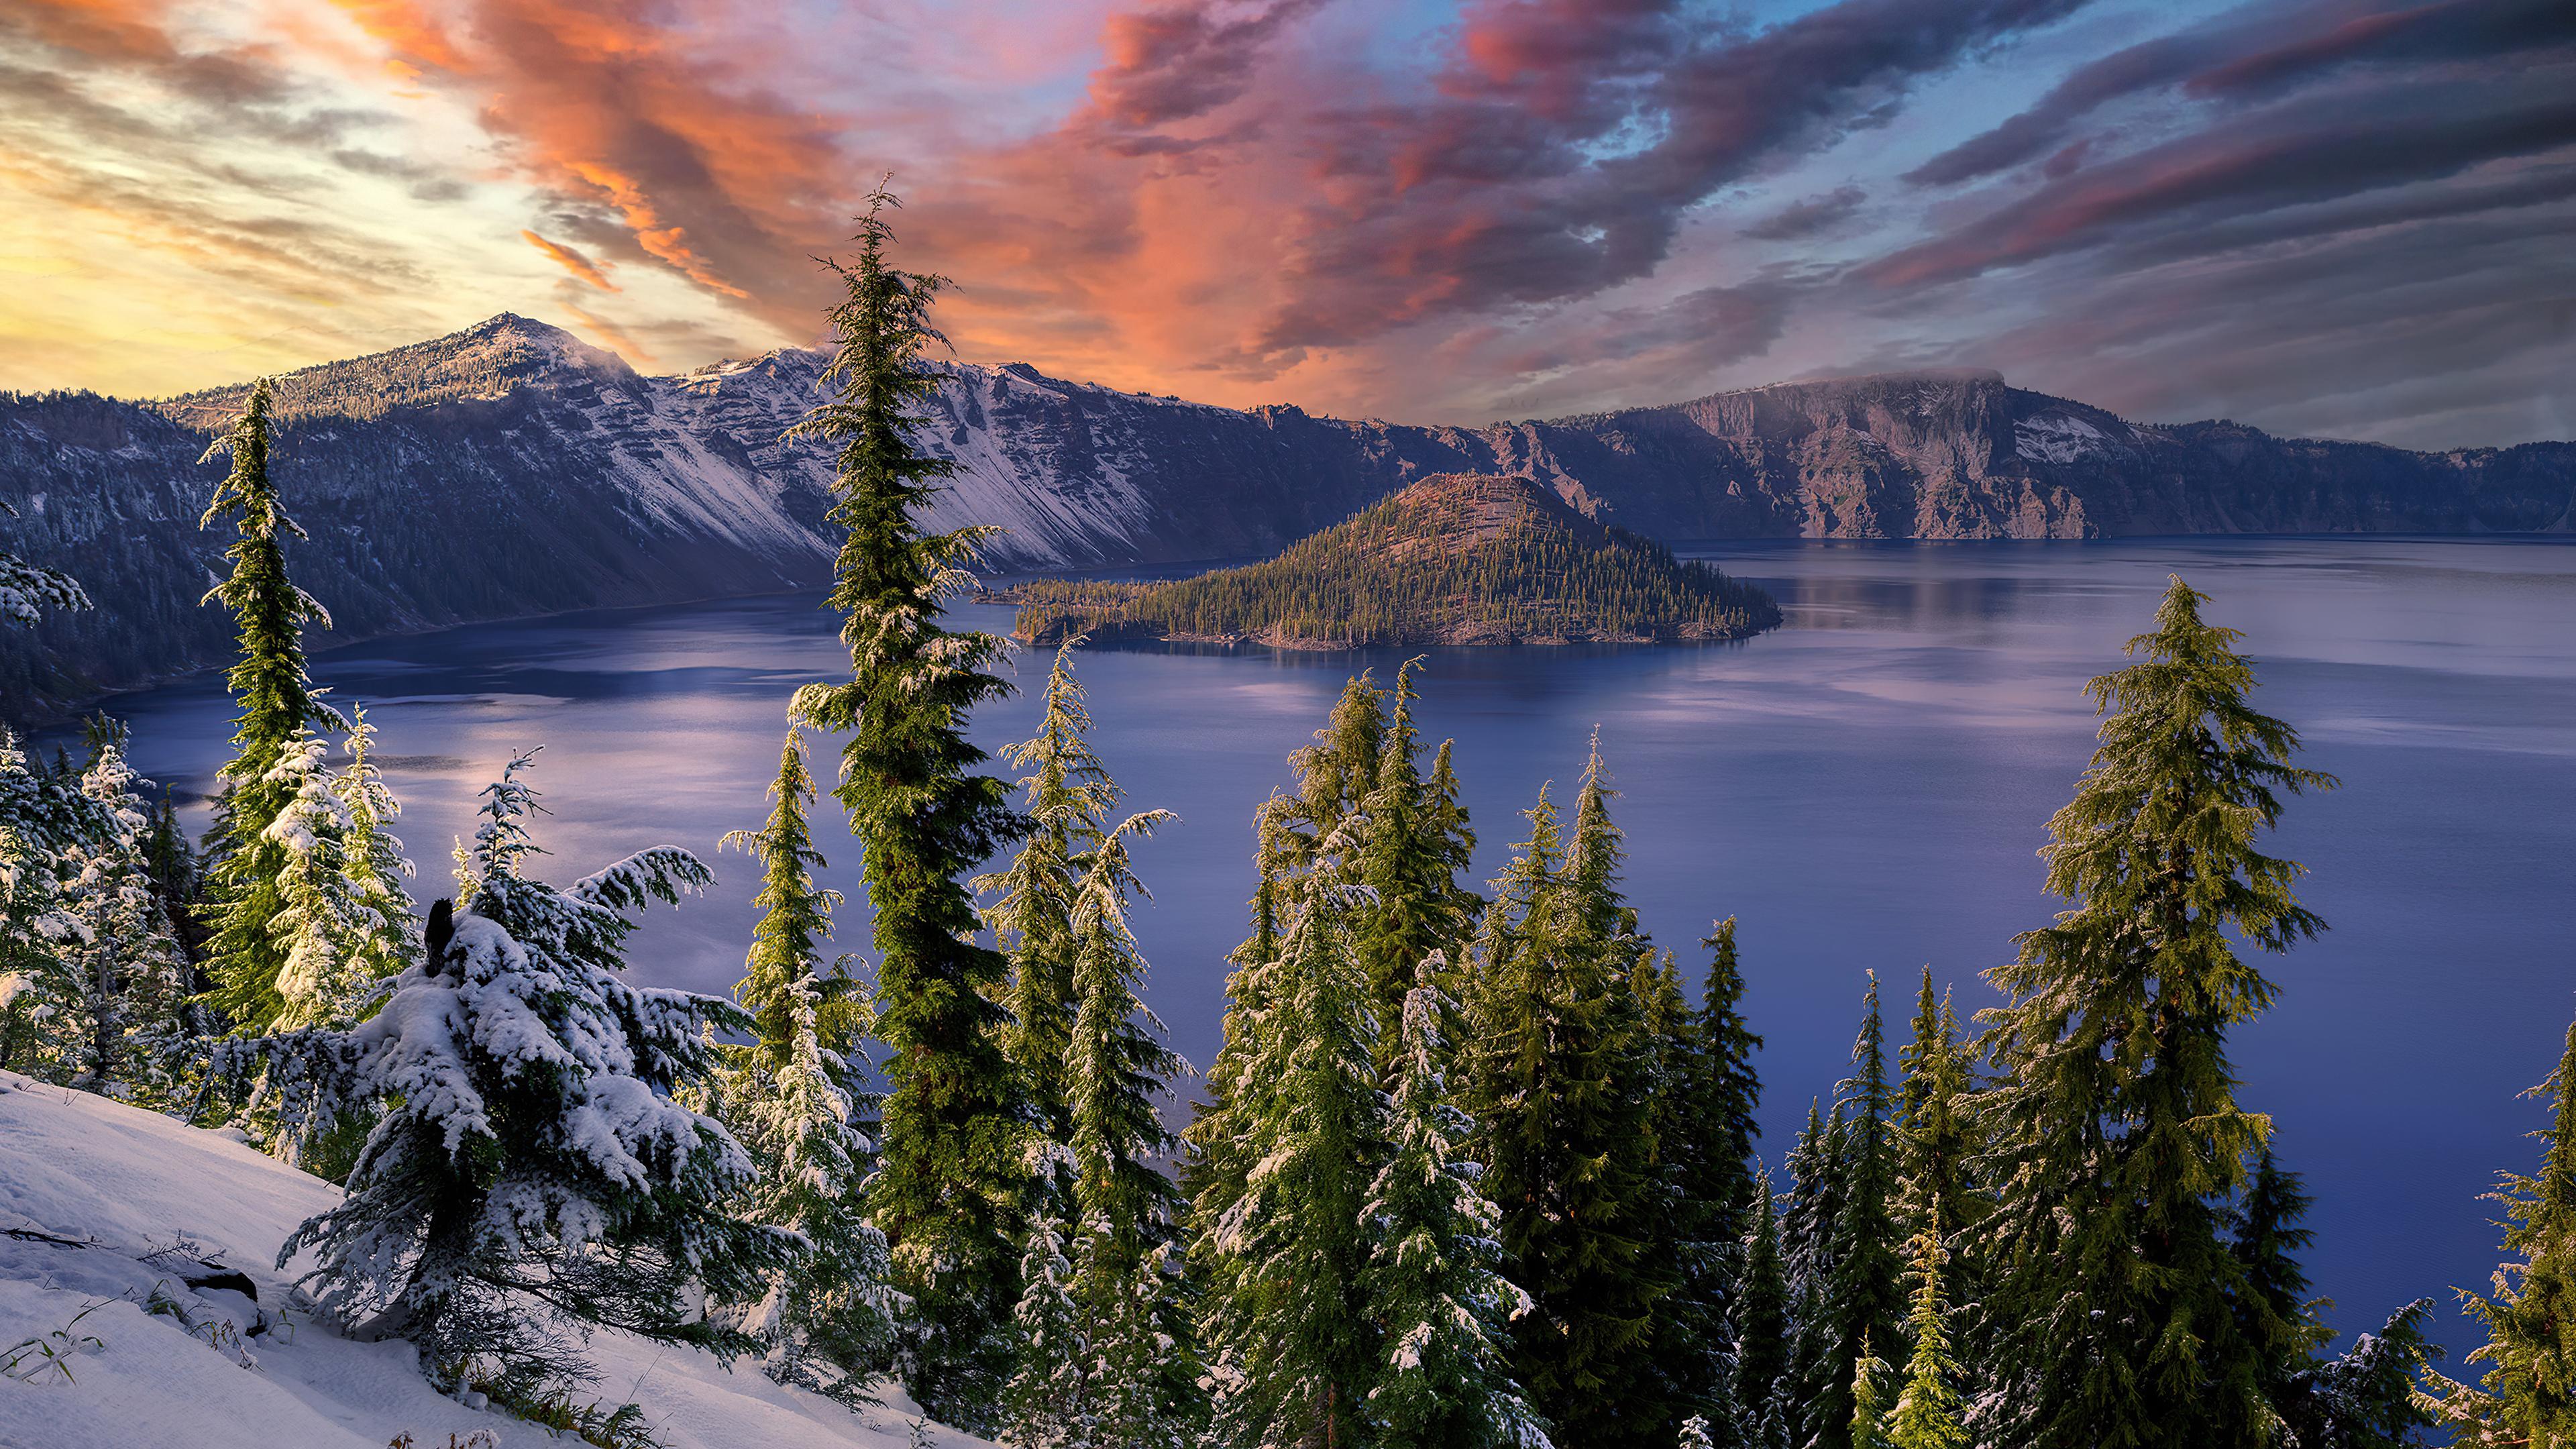 3840x2160 Winter Snow Trees Mountains Landscape Hdr 4k 4k ...